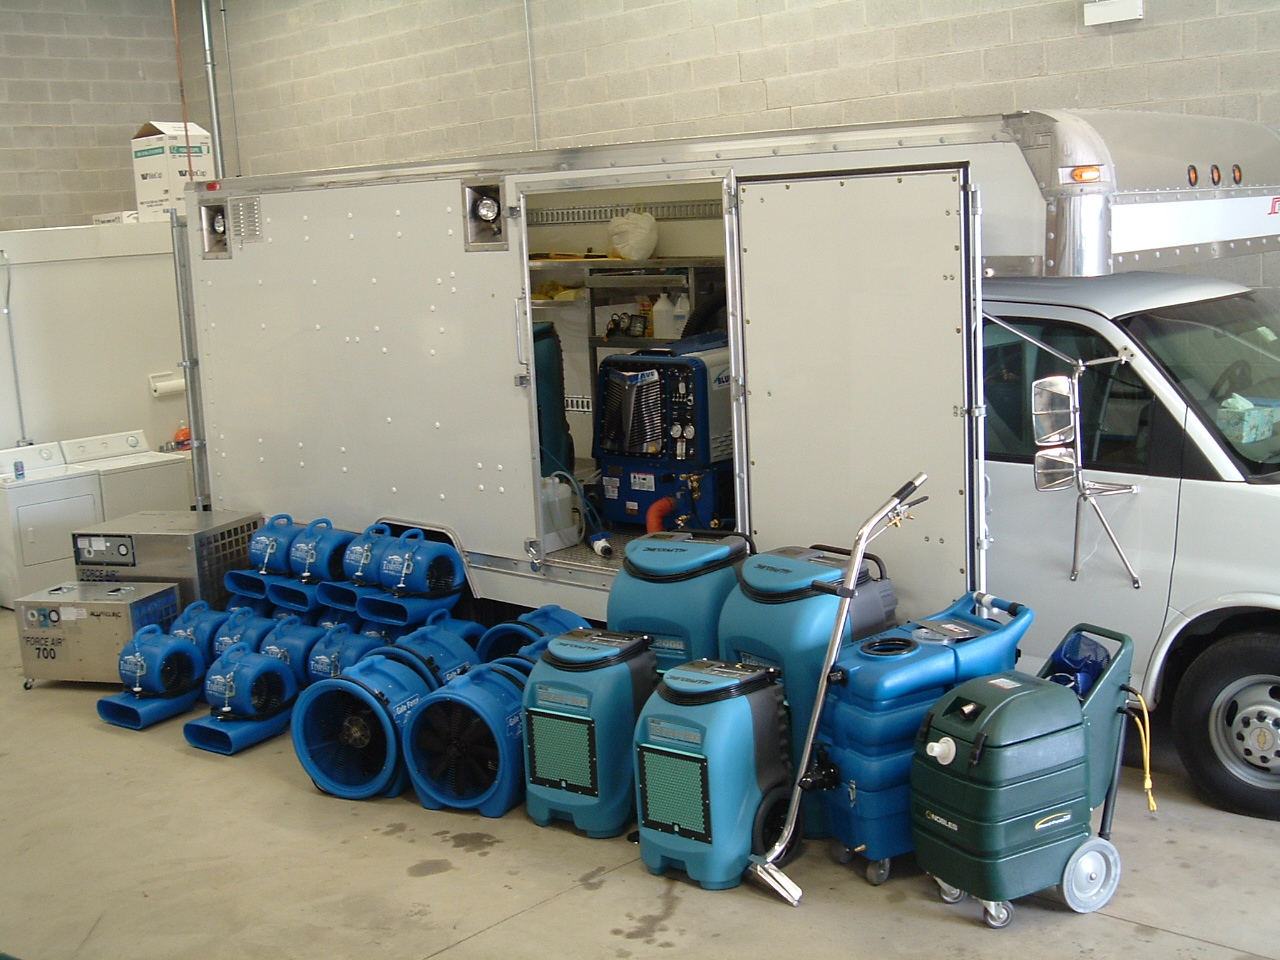 Water Damage Services : Fire restoration construction service group pc